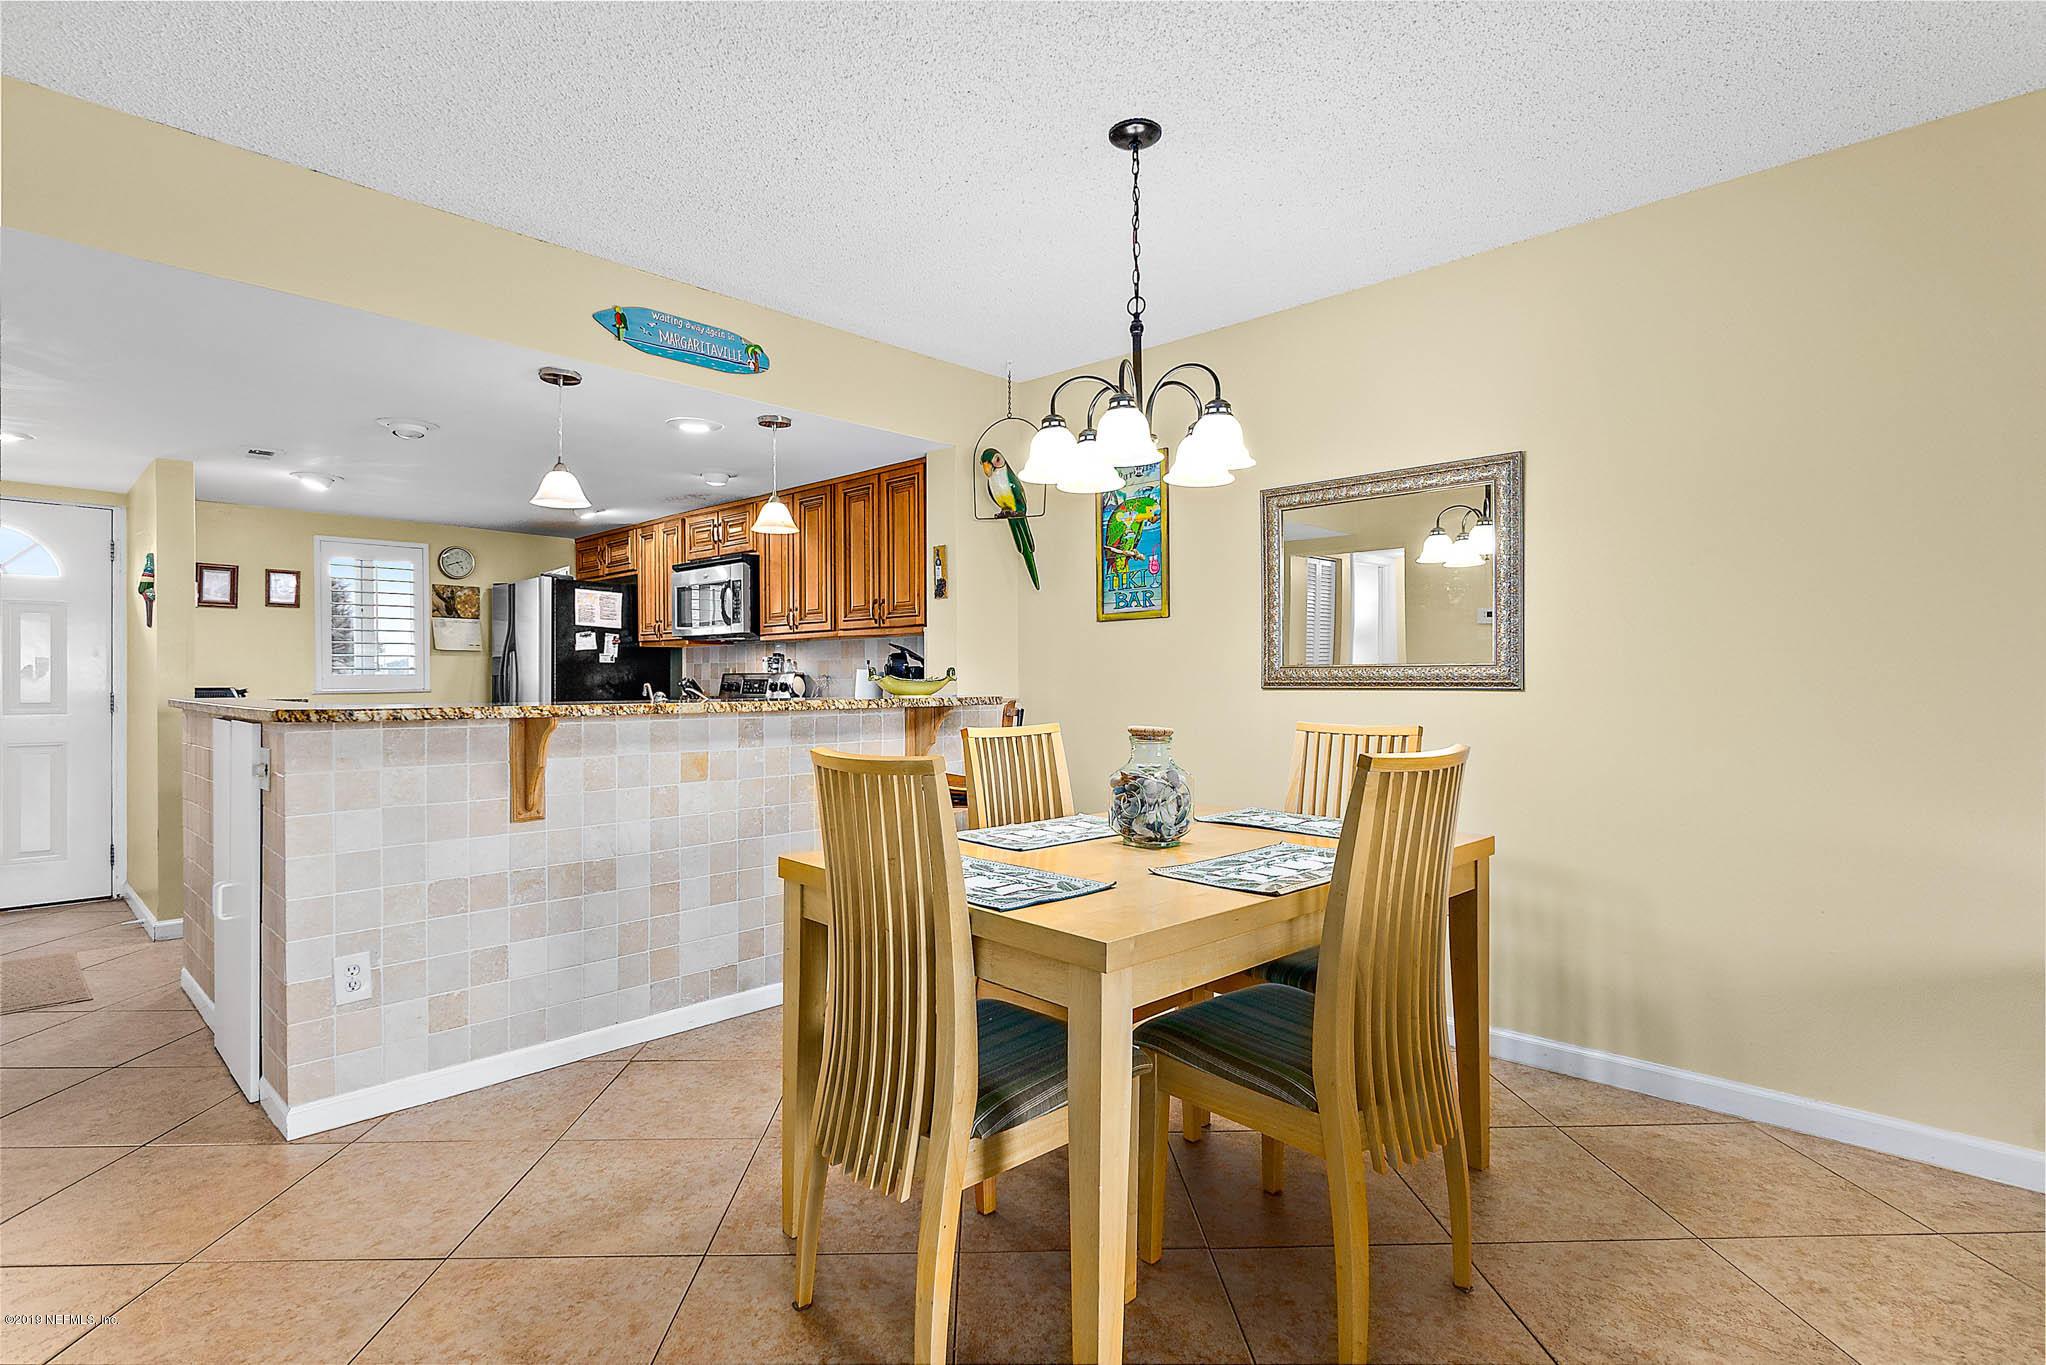 4 OCEAN TRACE, ST AUGUSTINE, FLORIDA 32080, 2 Bedrooms Bedrooms, ,2 BathroomsBathrooms,Condo,For sale,OCEAN TRACE,1019588